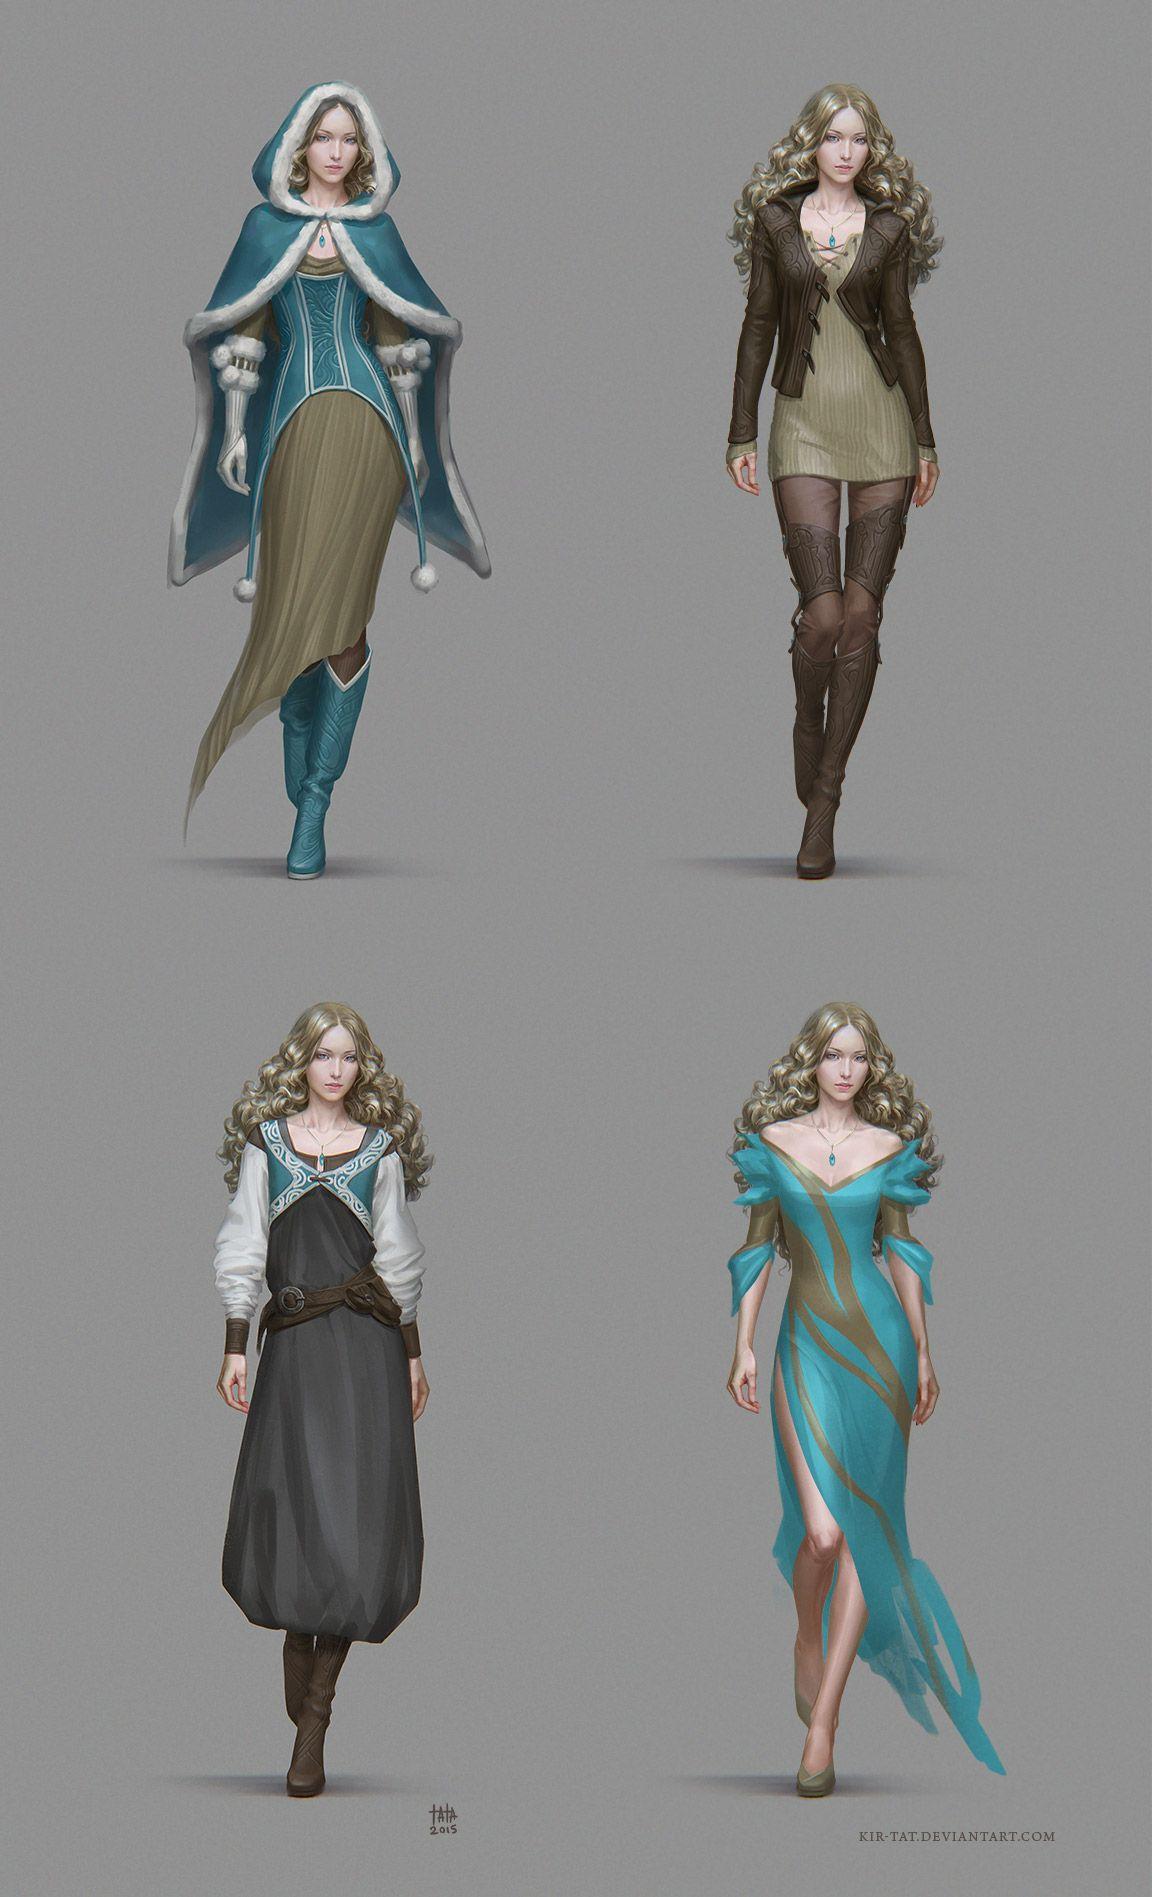 Character Design Dress Up : Dresses by kir tat dress gown hooded cloak female wizard